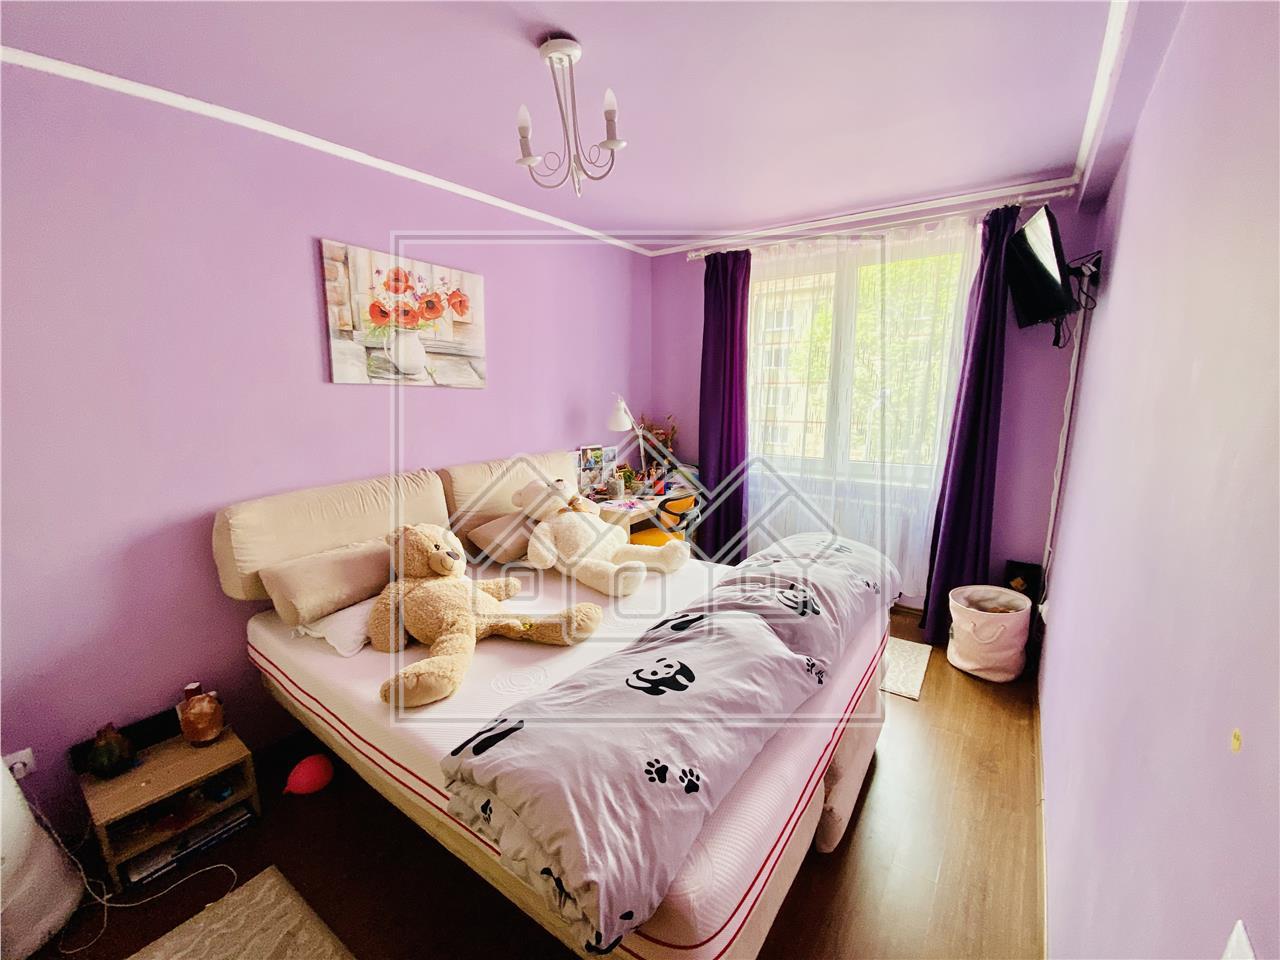 Apartament de vanzare in Sibiu-2 camere cu balcon-etaj 2/5-Zona Luptei